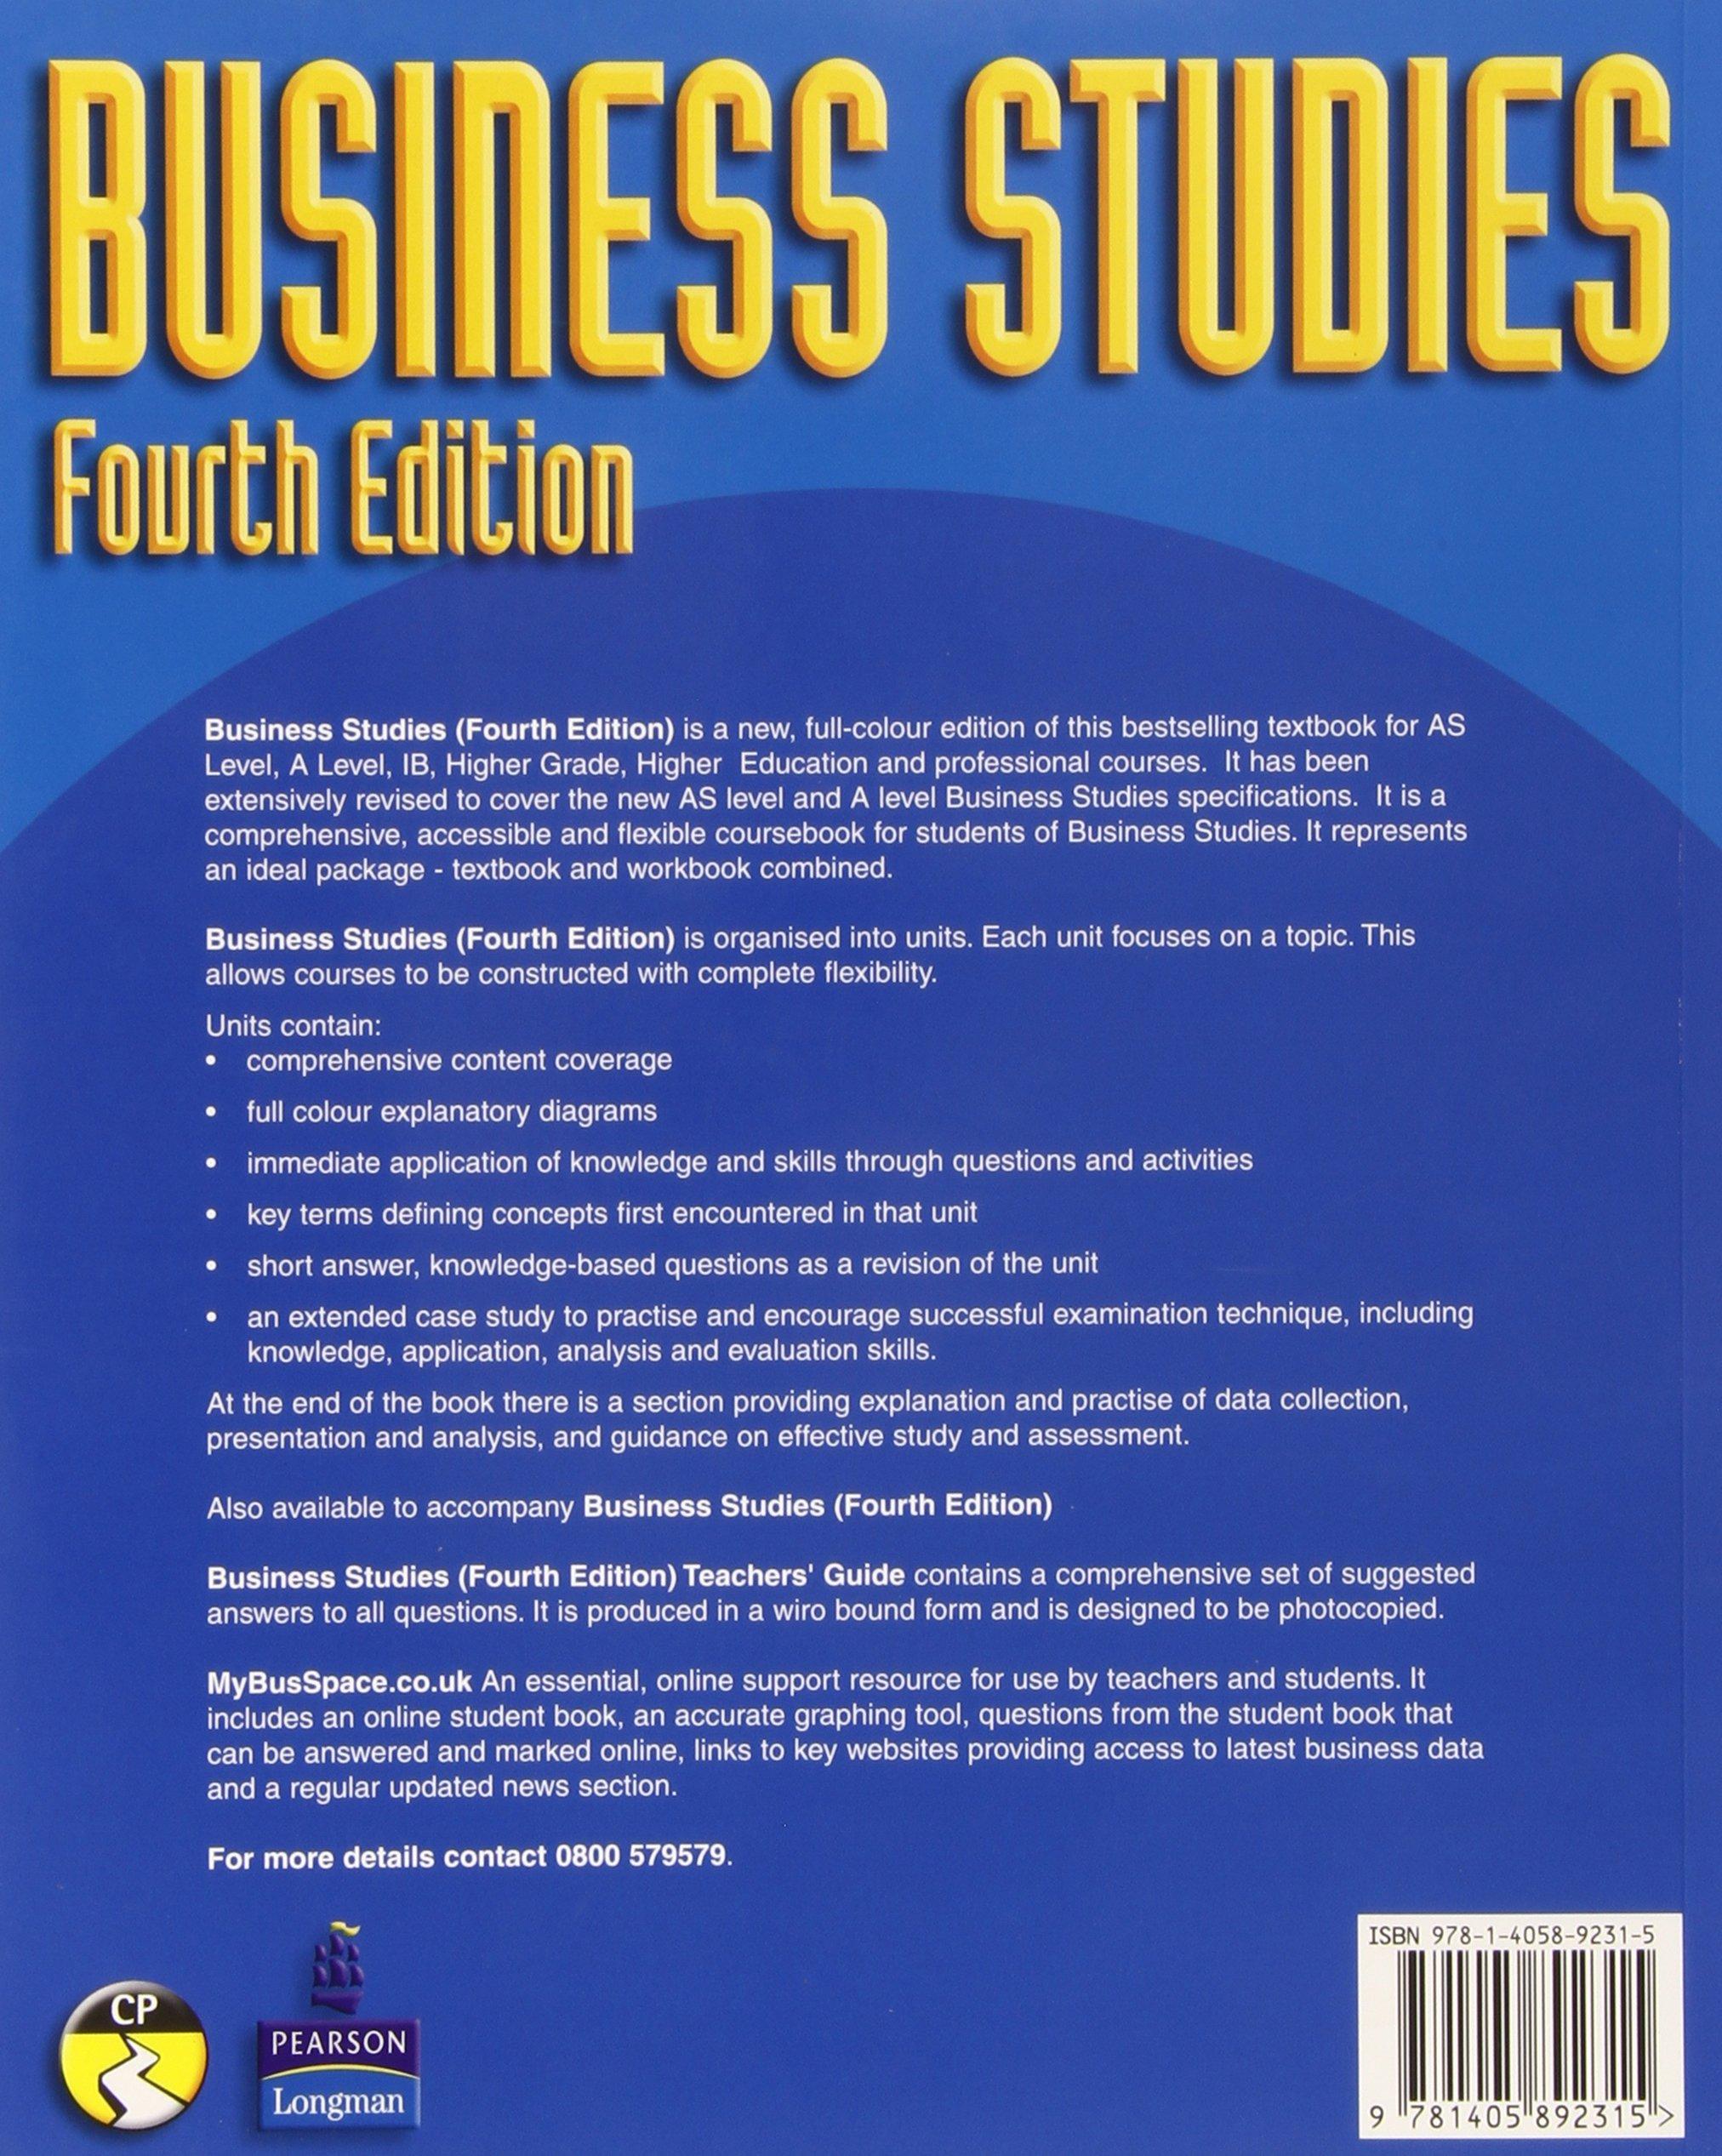 Business Studies Textbook Pdf